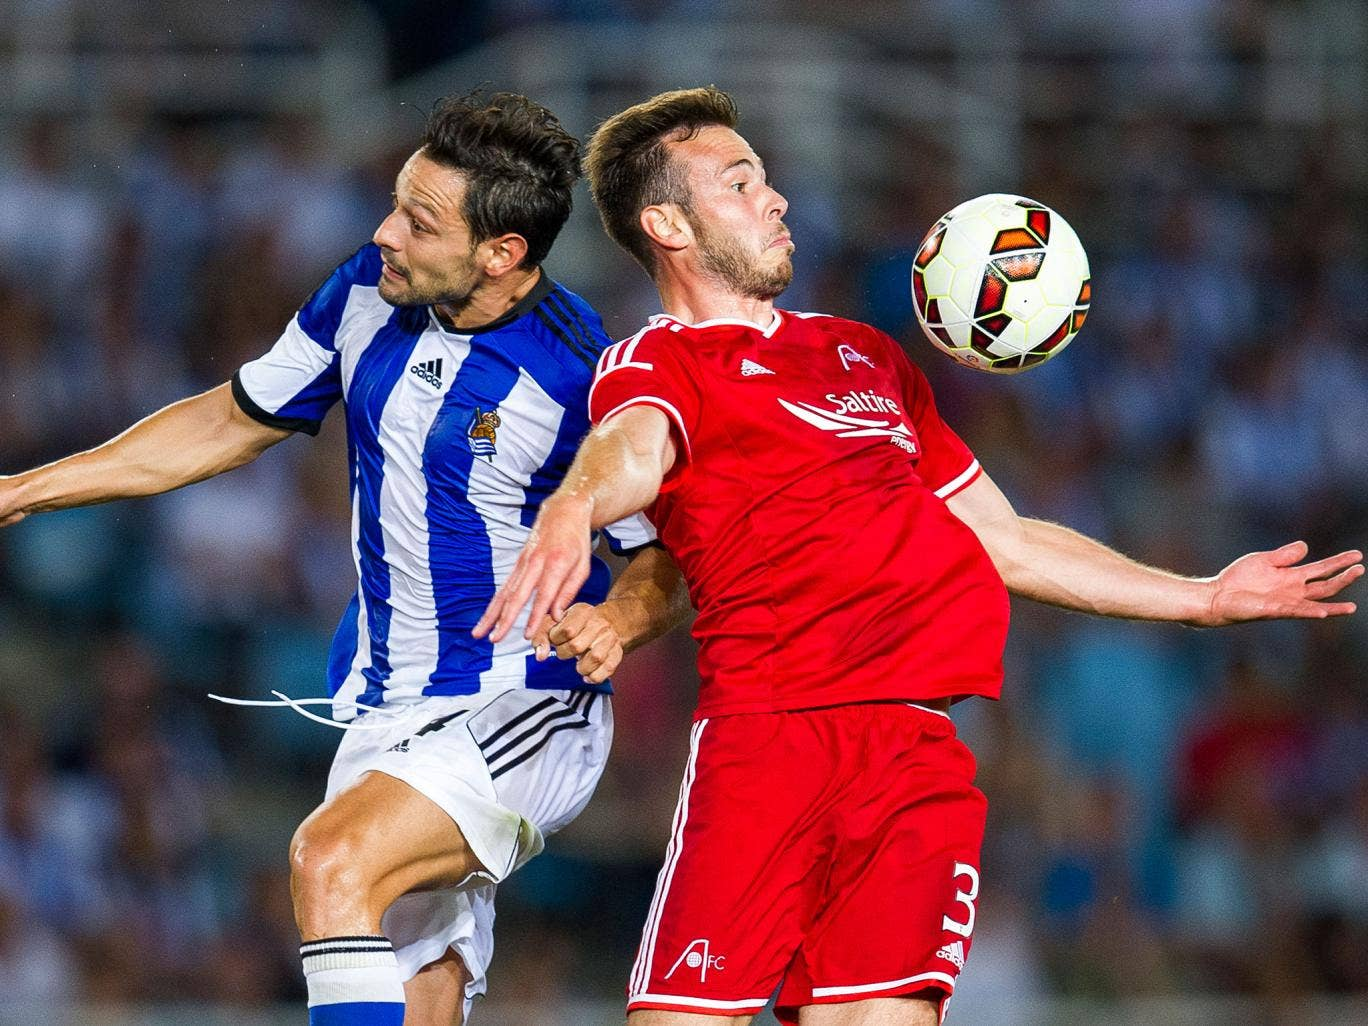 Andrew Considine of Aberdeen CF duels for the ball with Alberto de la Bella of Real Sociedad